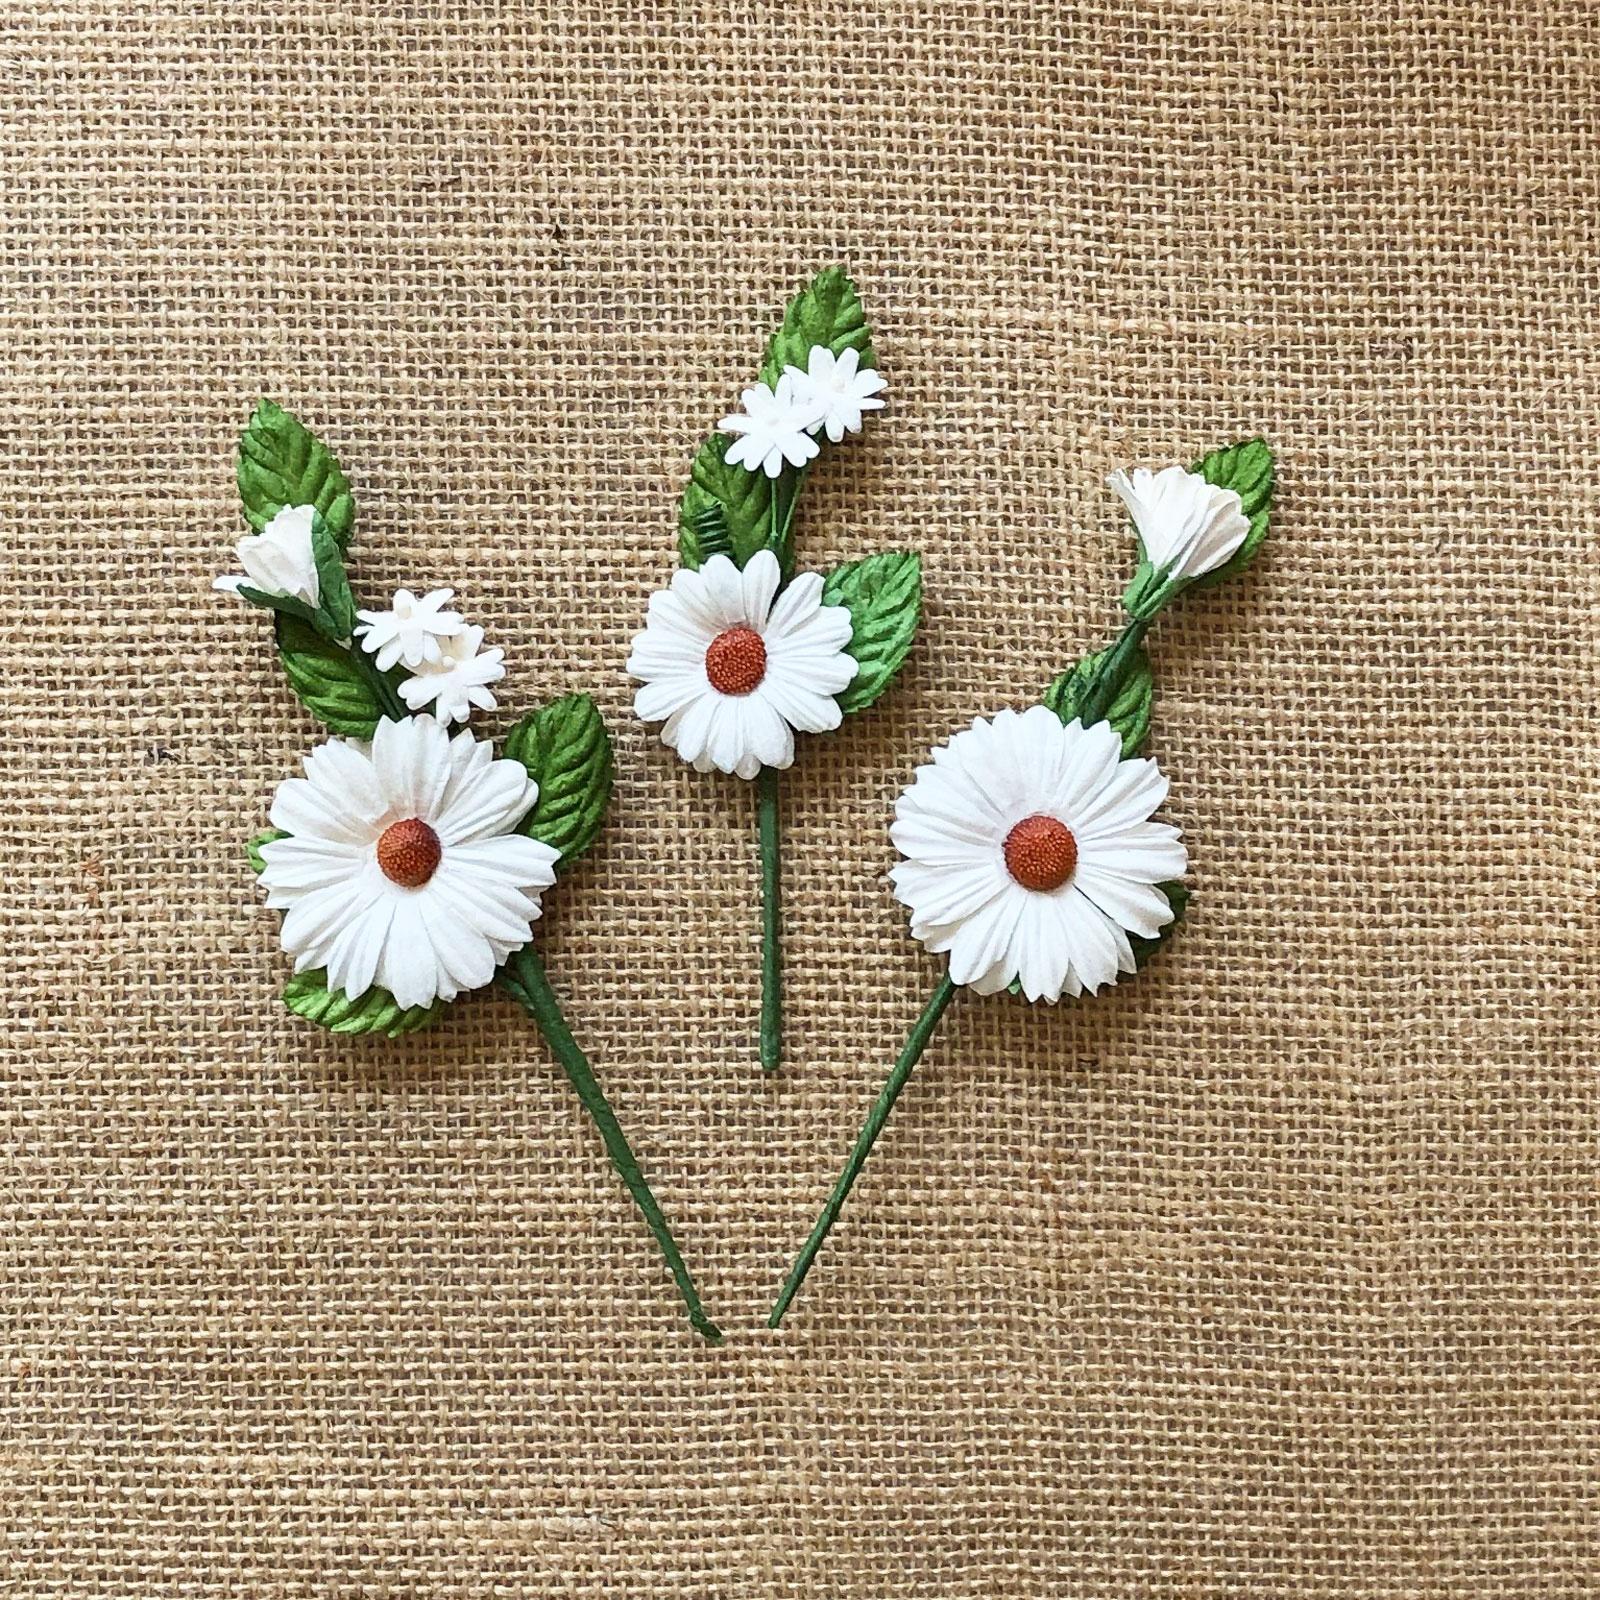 Daisy Stems- White